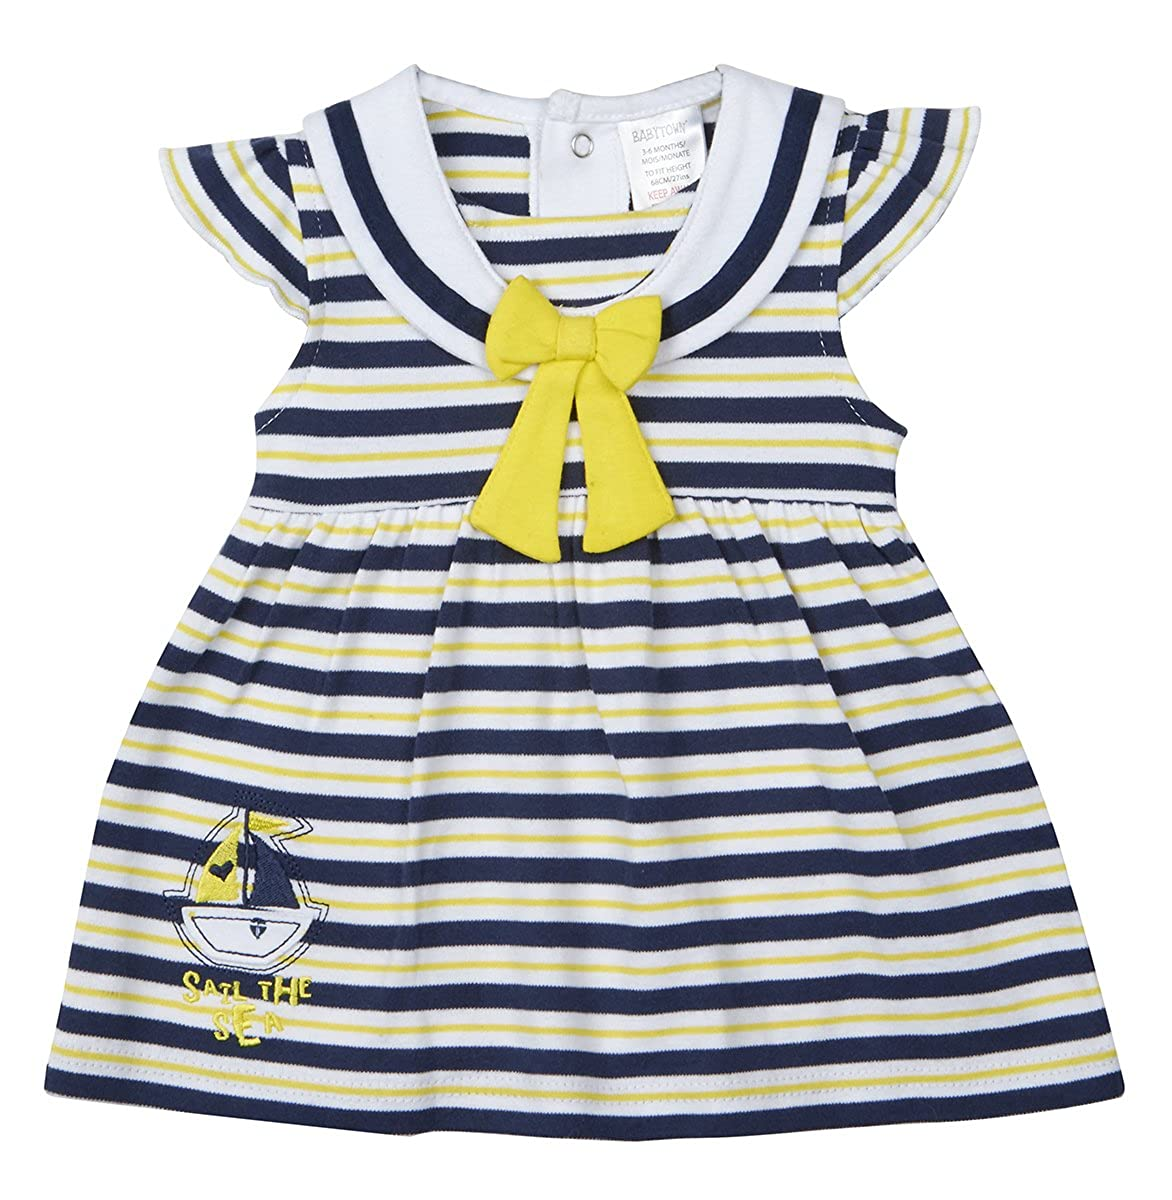 BABYPREM Baby Girls Clothes Premature Tiny Nautical Dress Dresses 1.5-7.5lb